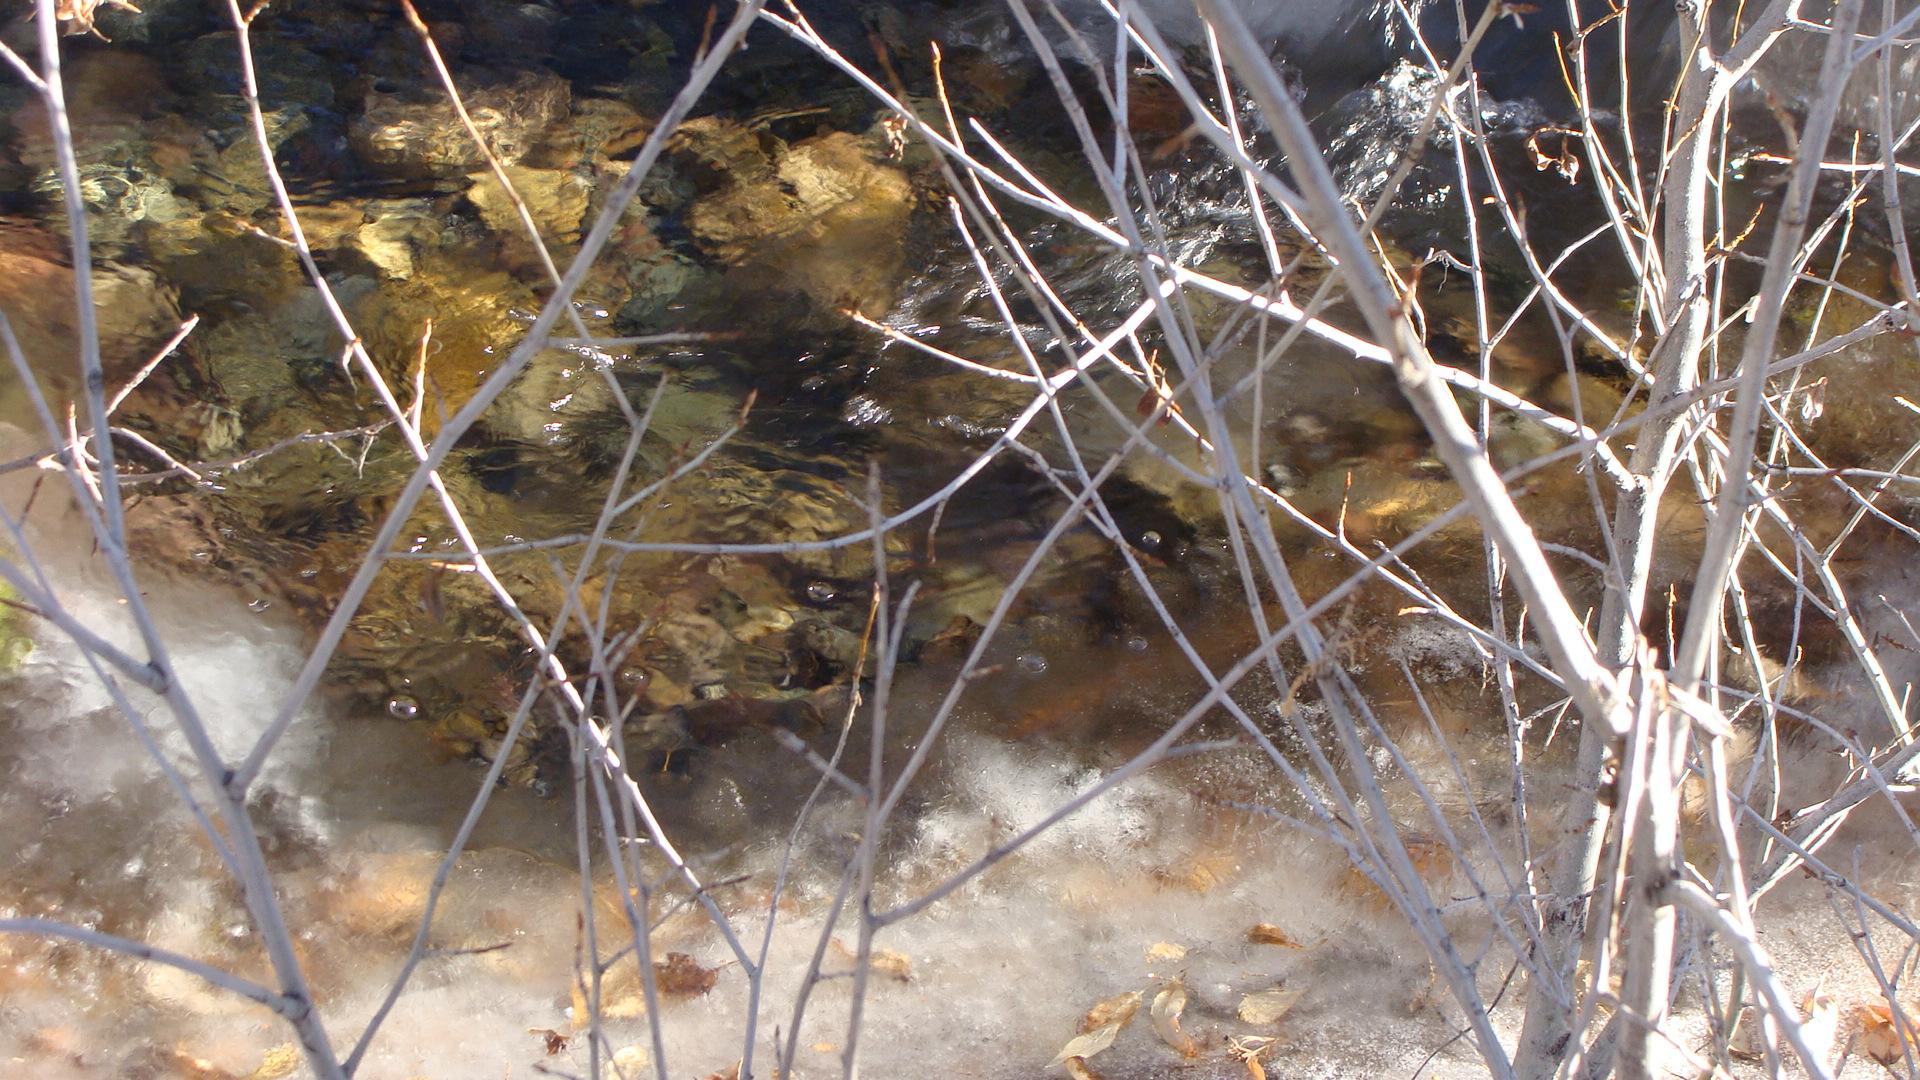 A quiet moment at Cottonwood Creek